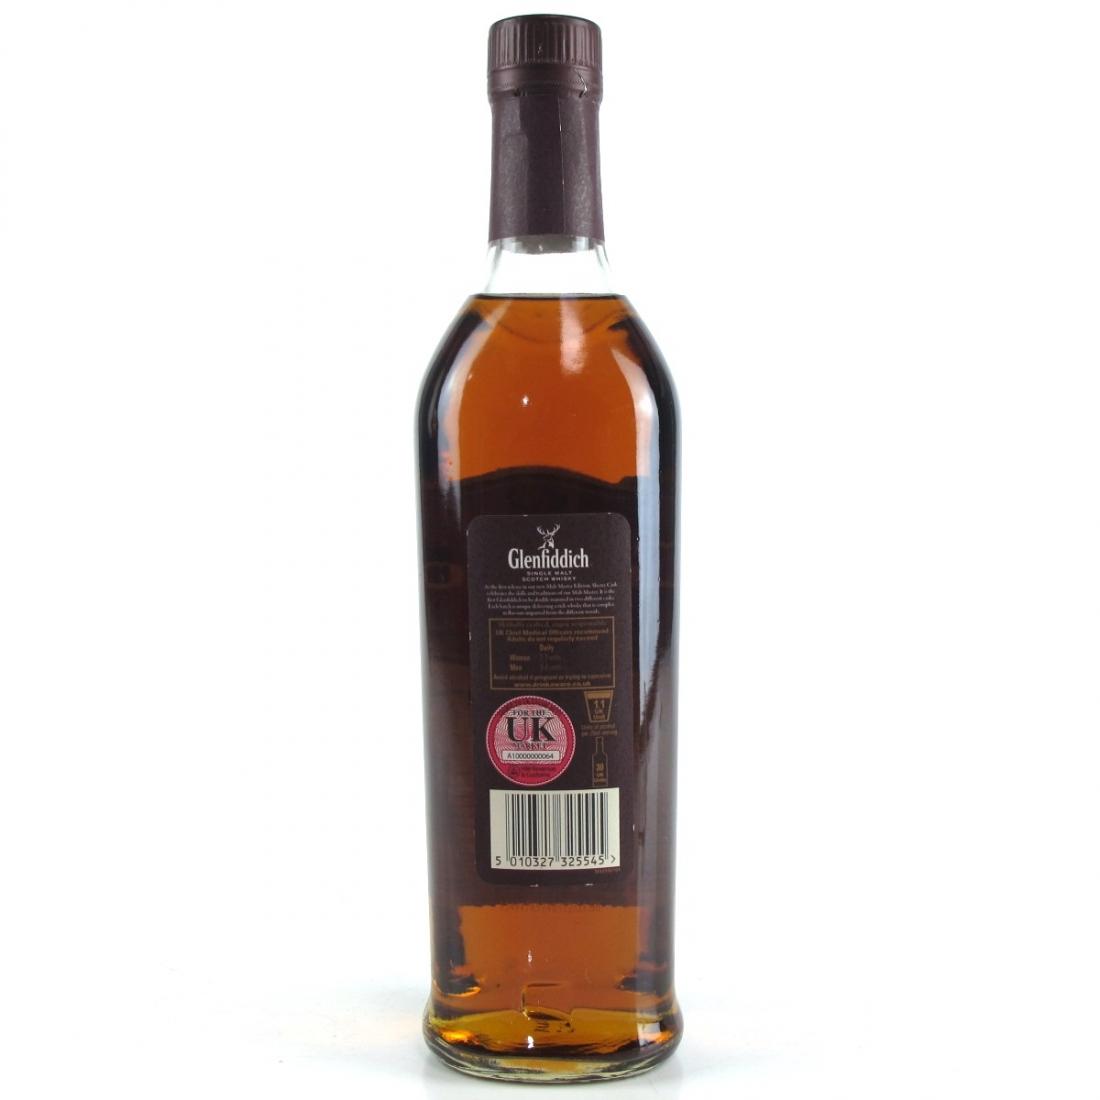 Glenfiddich Malt Master's Edition Batch 01/11